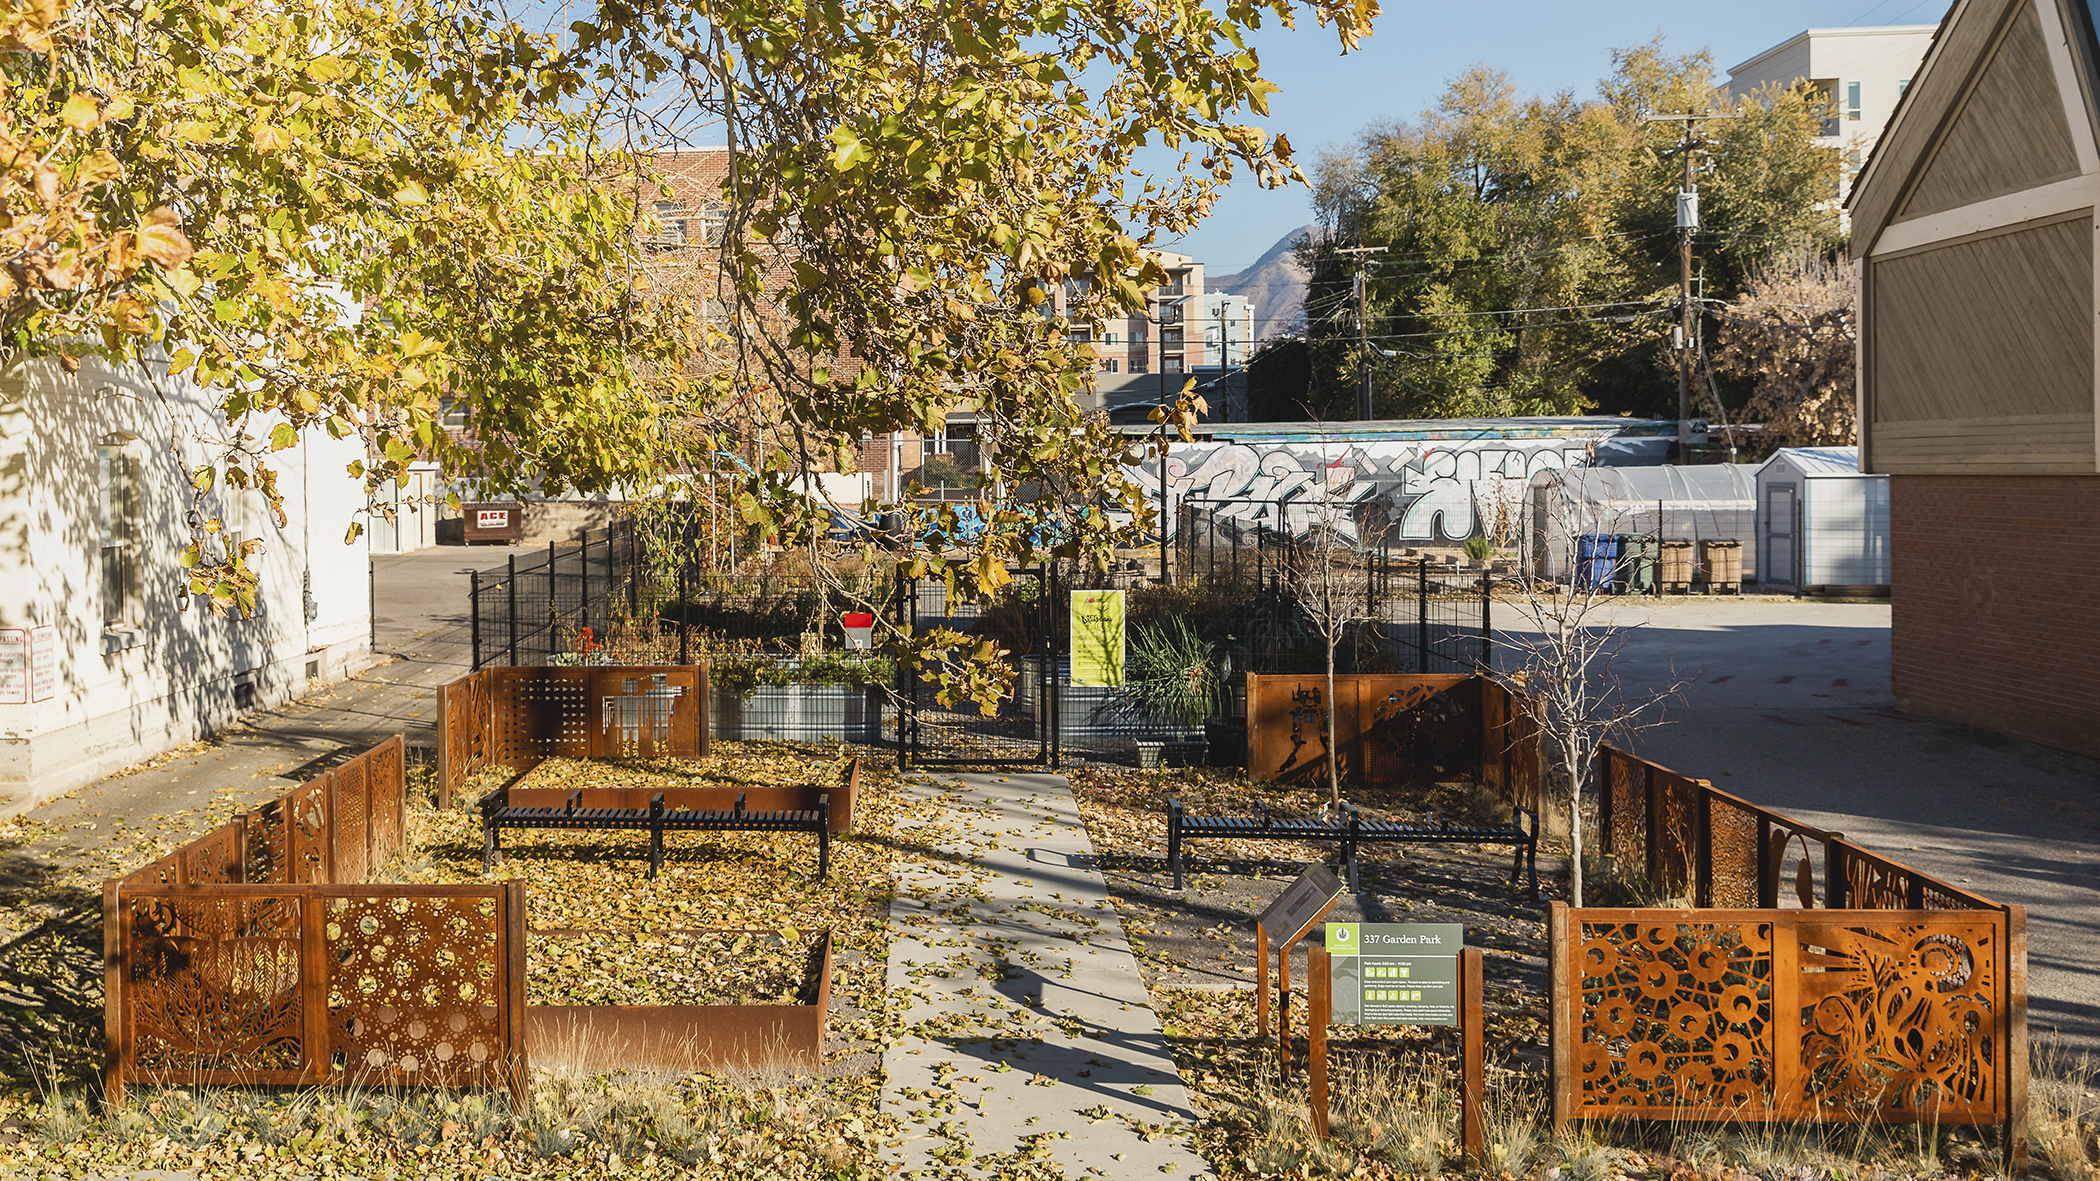 Veggie Garden — 337 Pocket Park Fence